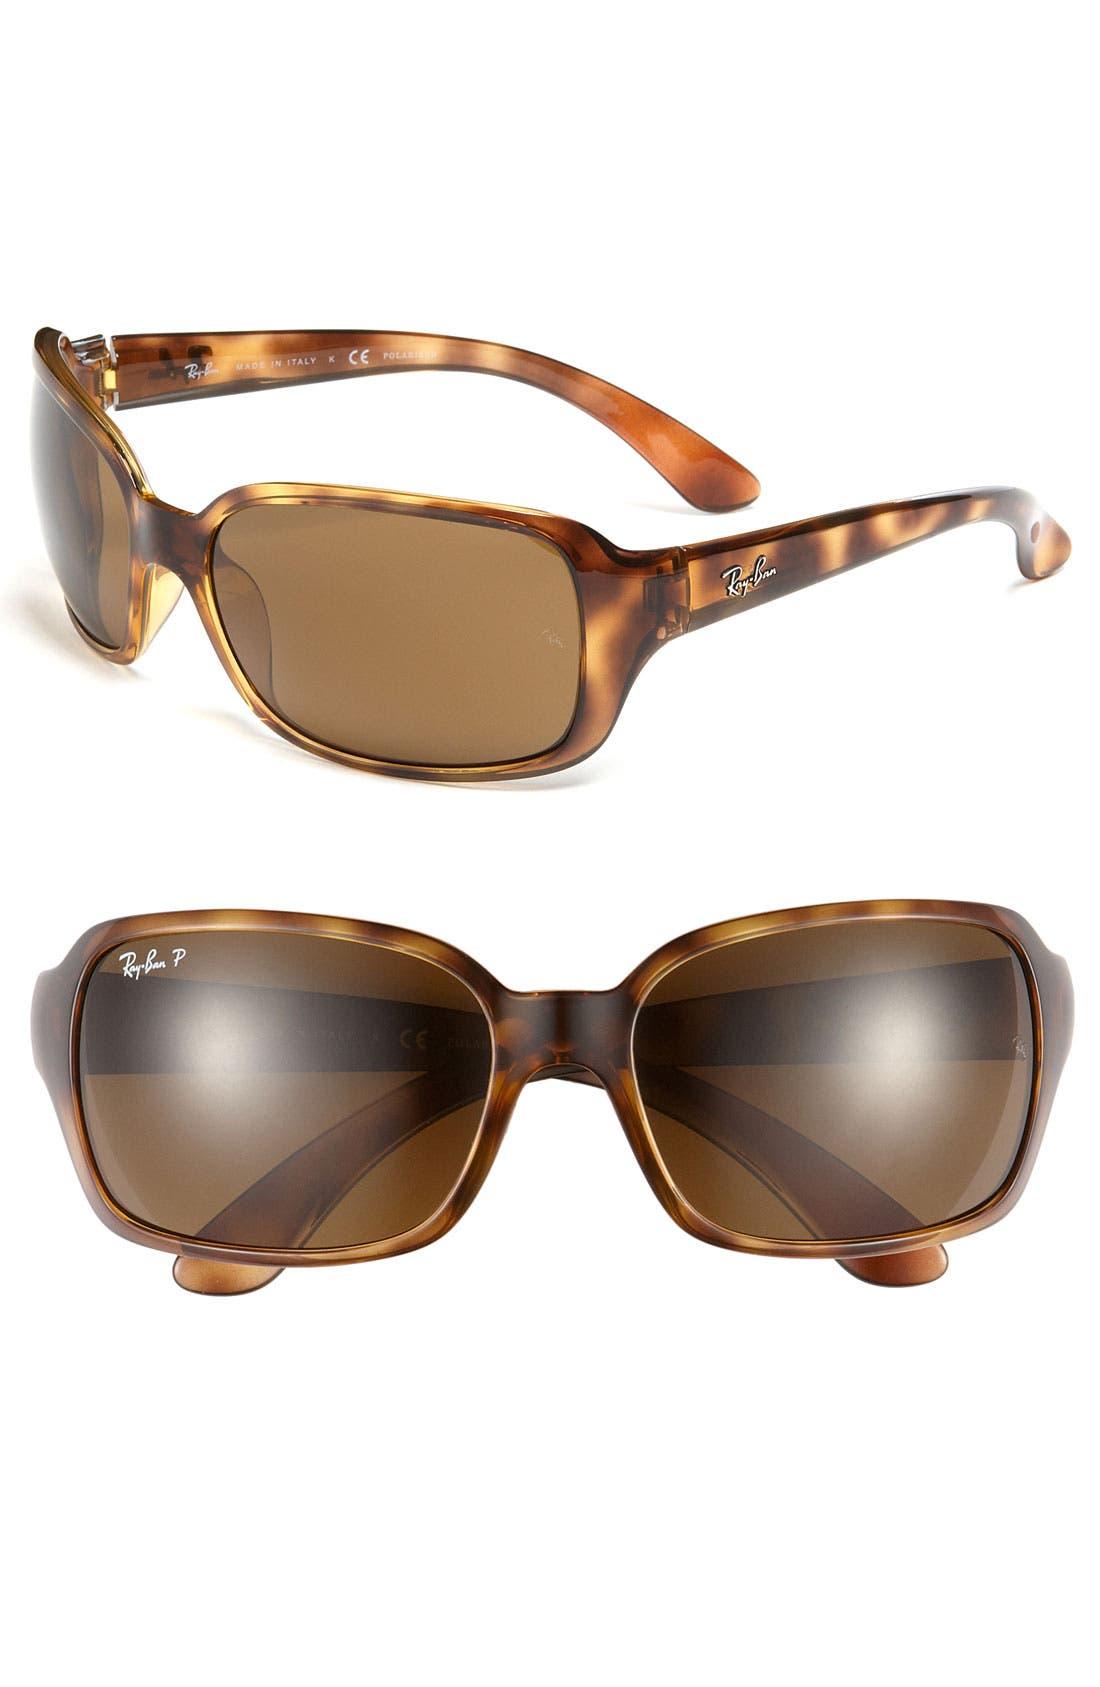 Alternate Image 1 Selected - Ray-Ban 'Big Glamour' 60mm Polarized Sunglasses